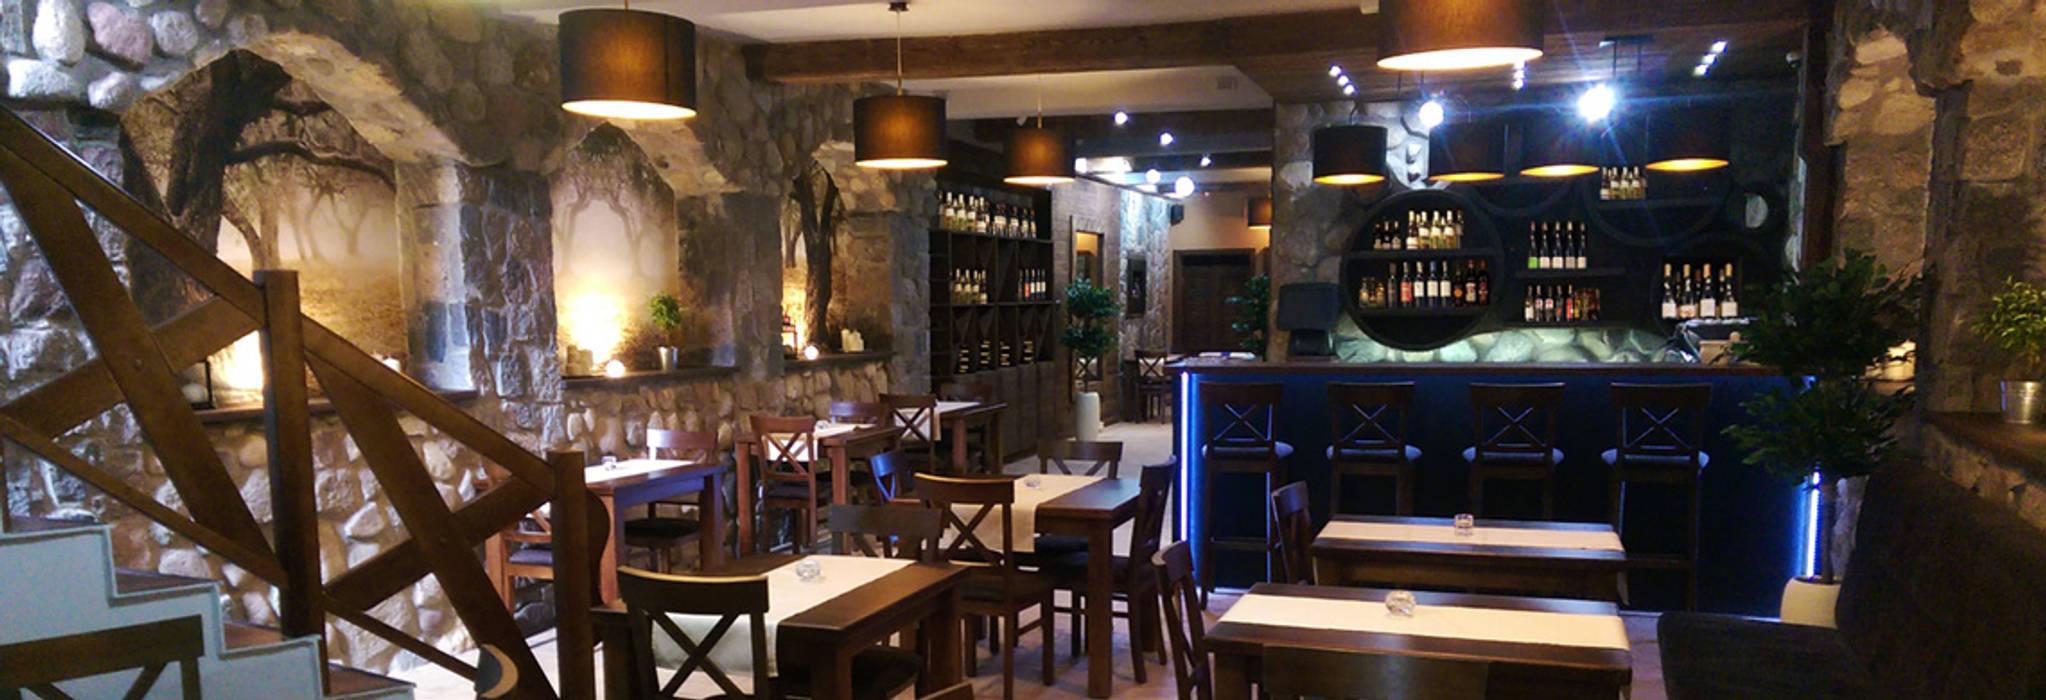 Ruang Penyimpanan Wine/Anggur Gaya Rustic Oleh Pracownia Wnętrz Rustic